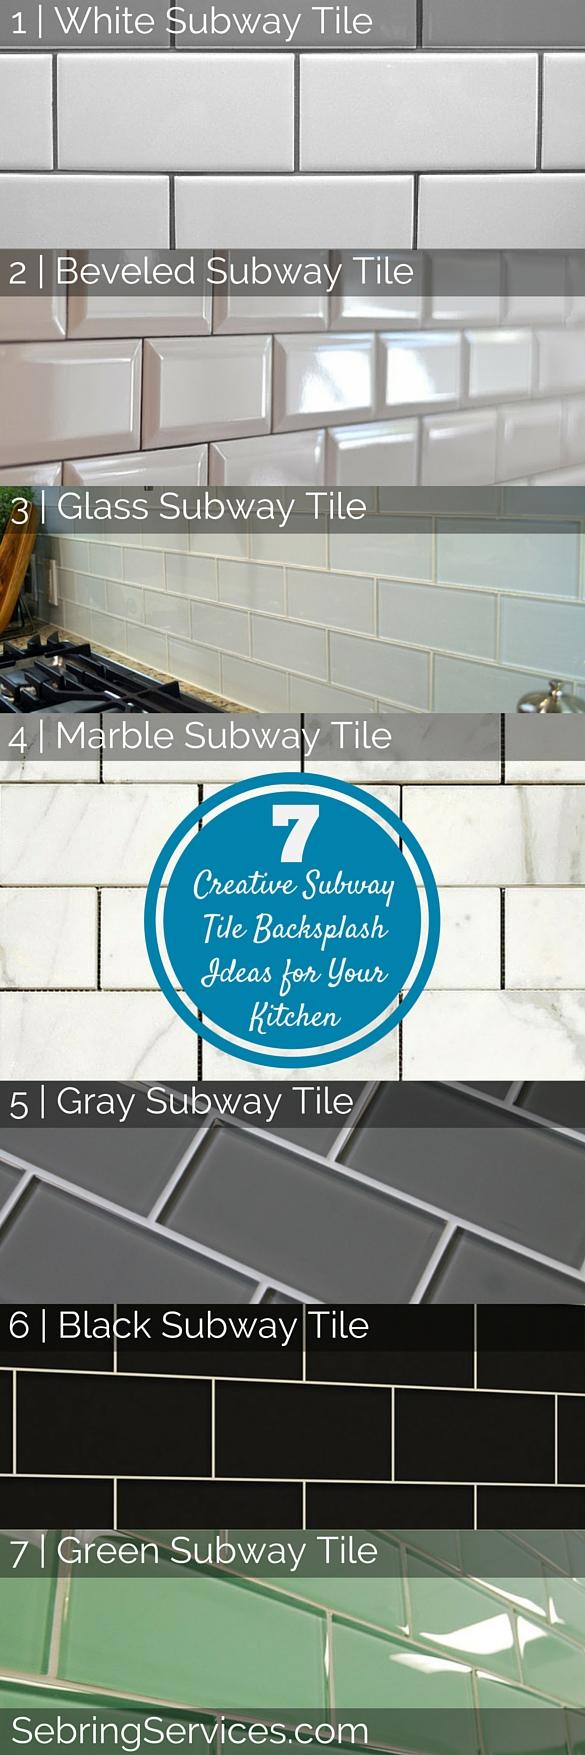 creative subway tile backsplash ideas kitchen sebring kitchen tile backsplash design ideas news blogrollcenter